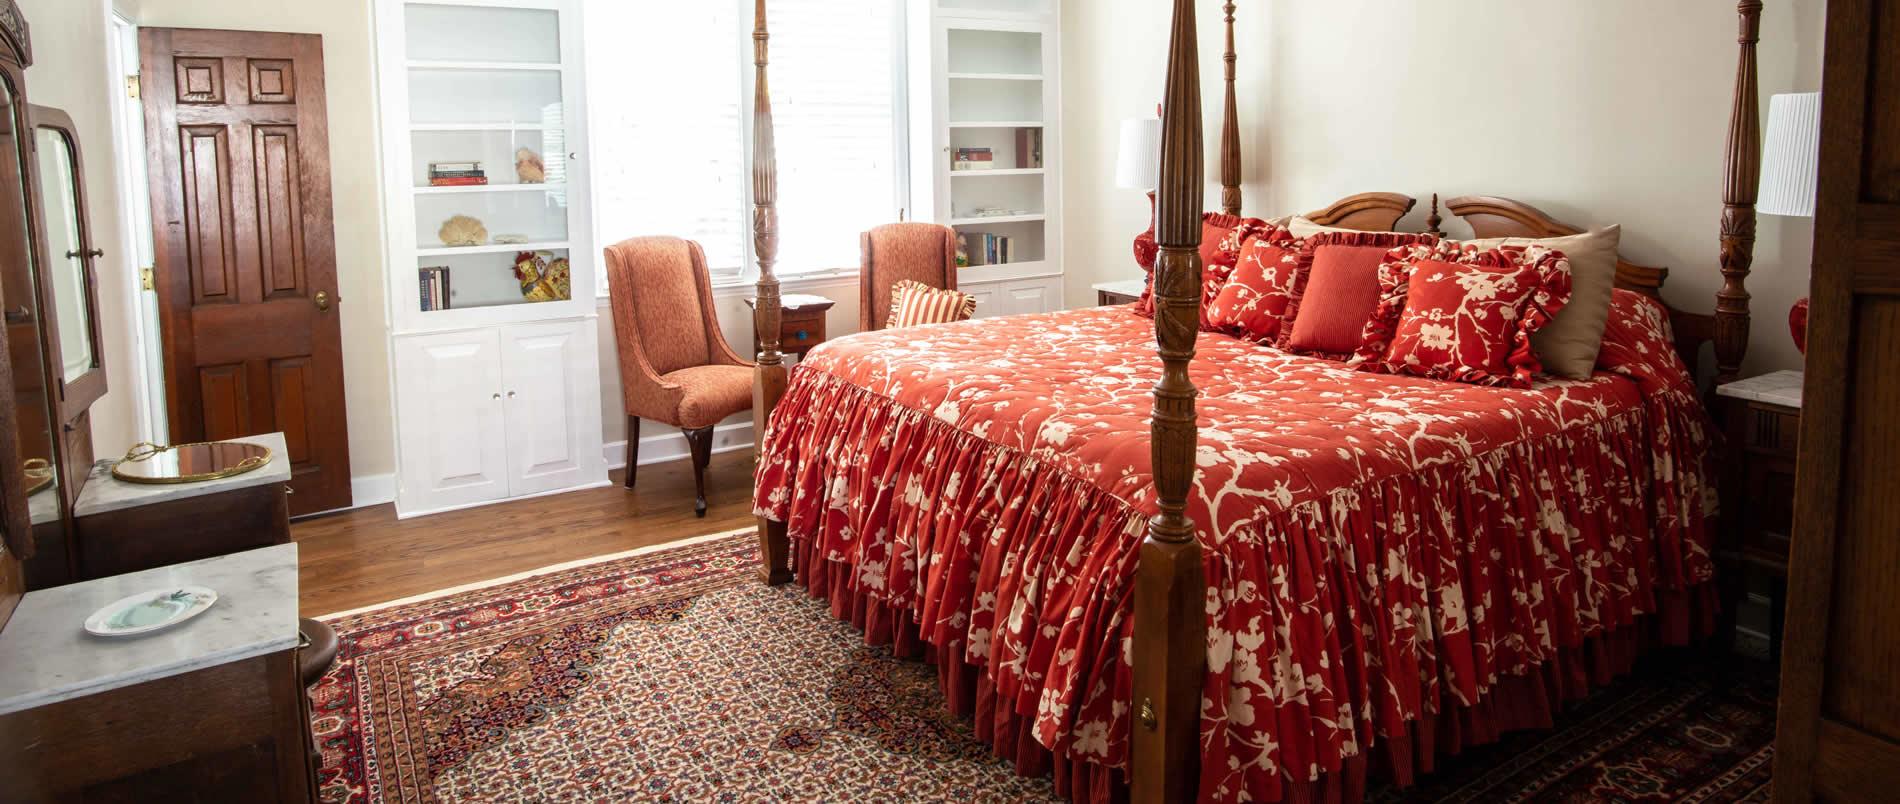 valparaiso inn bed and breakfast lodging guestroom